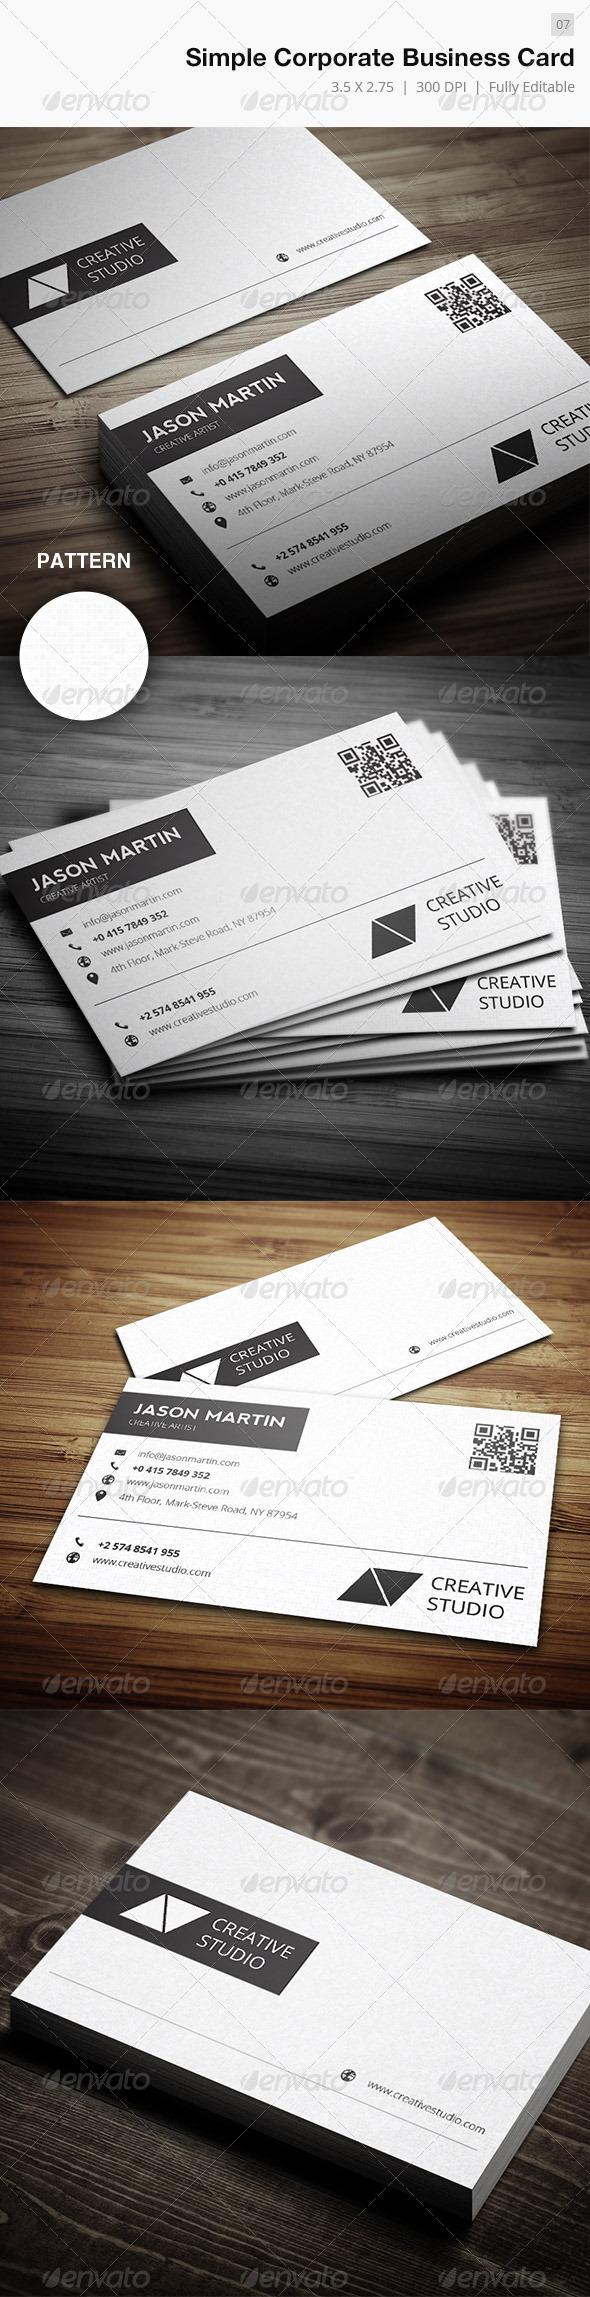 Simple Corporate Business Card - 07 - Corporate Business Cards